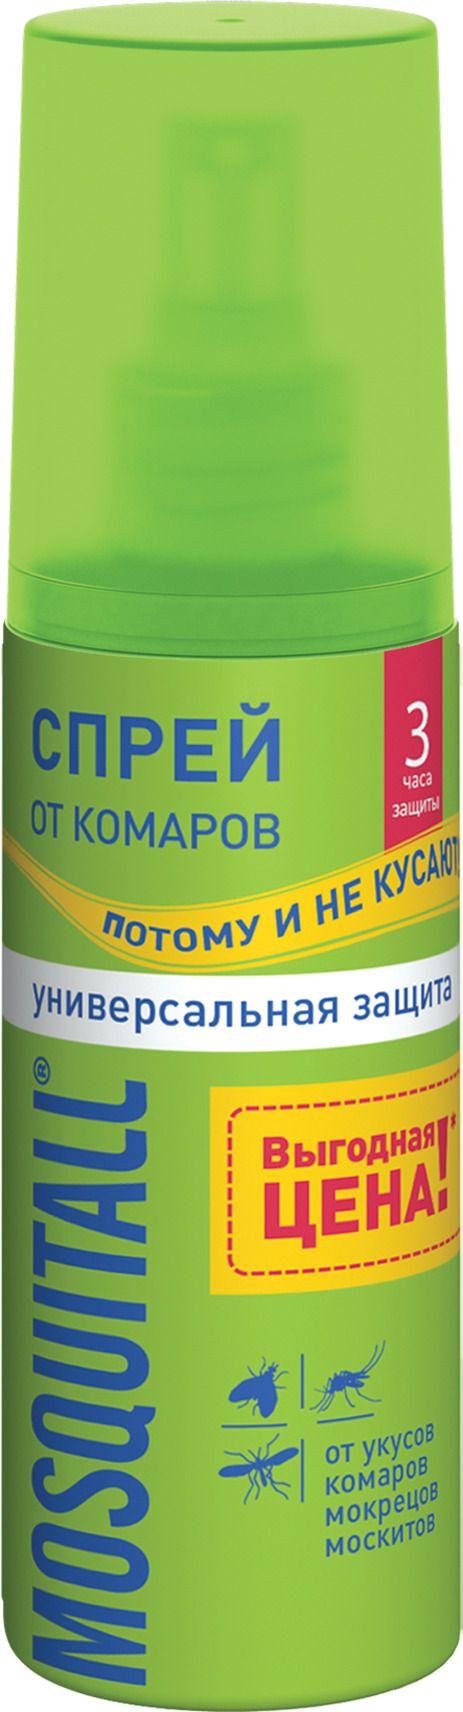 Mosquitall Универсальная защита спрей, спрей, на кожу, 100 мл, 1 шт.